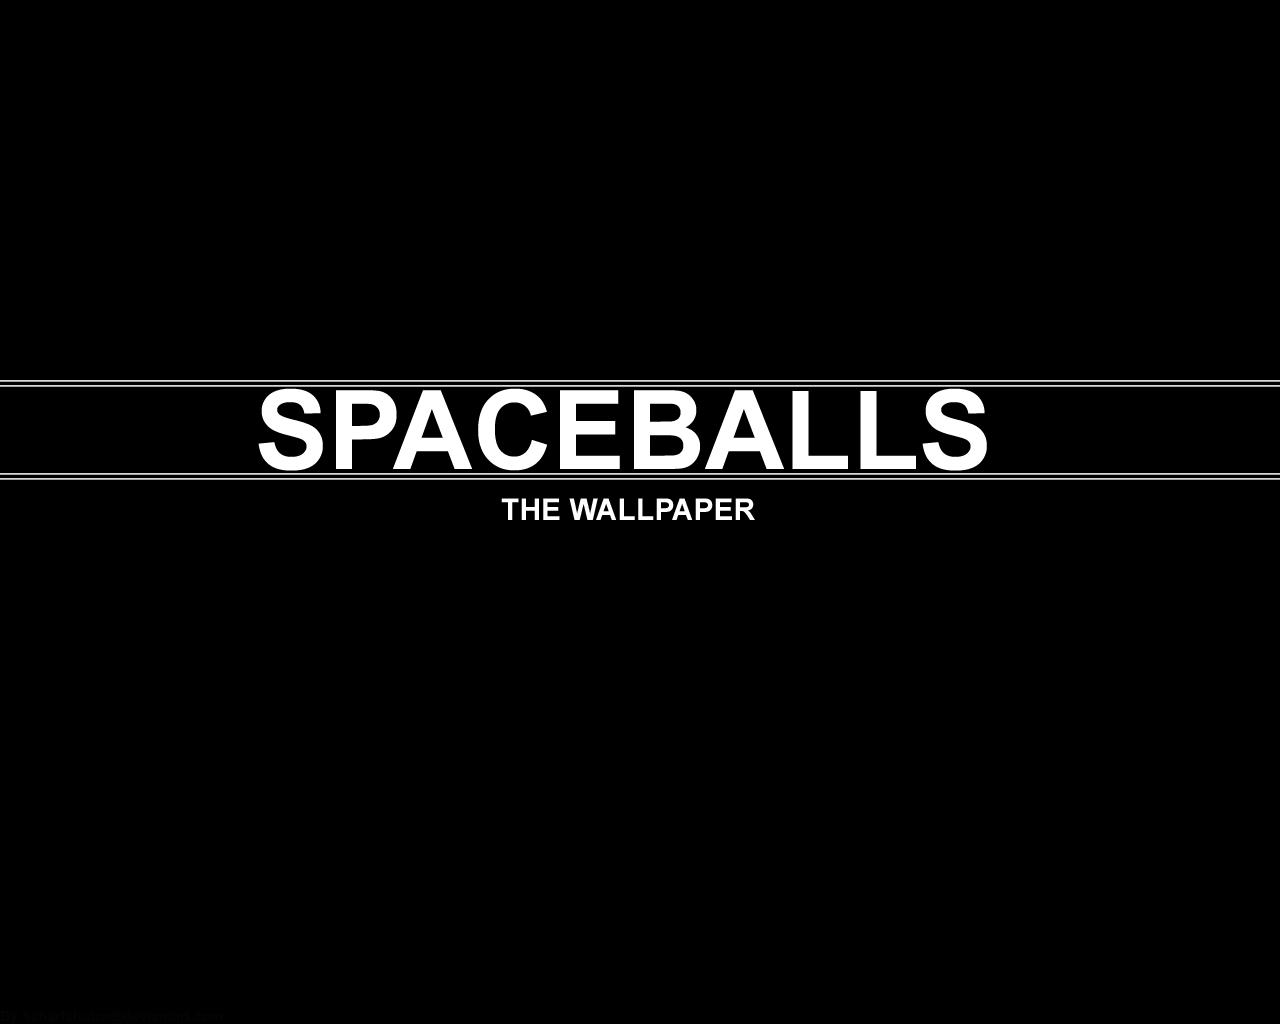 SPACEBALLS THE WALLPAPER by Skarpskyter